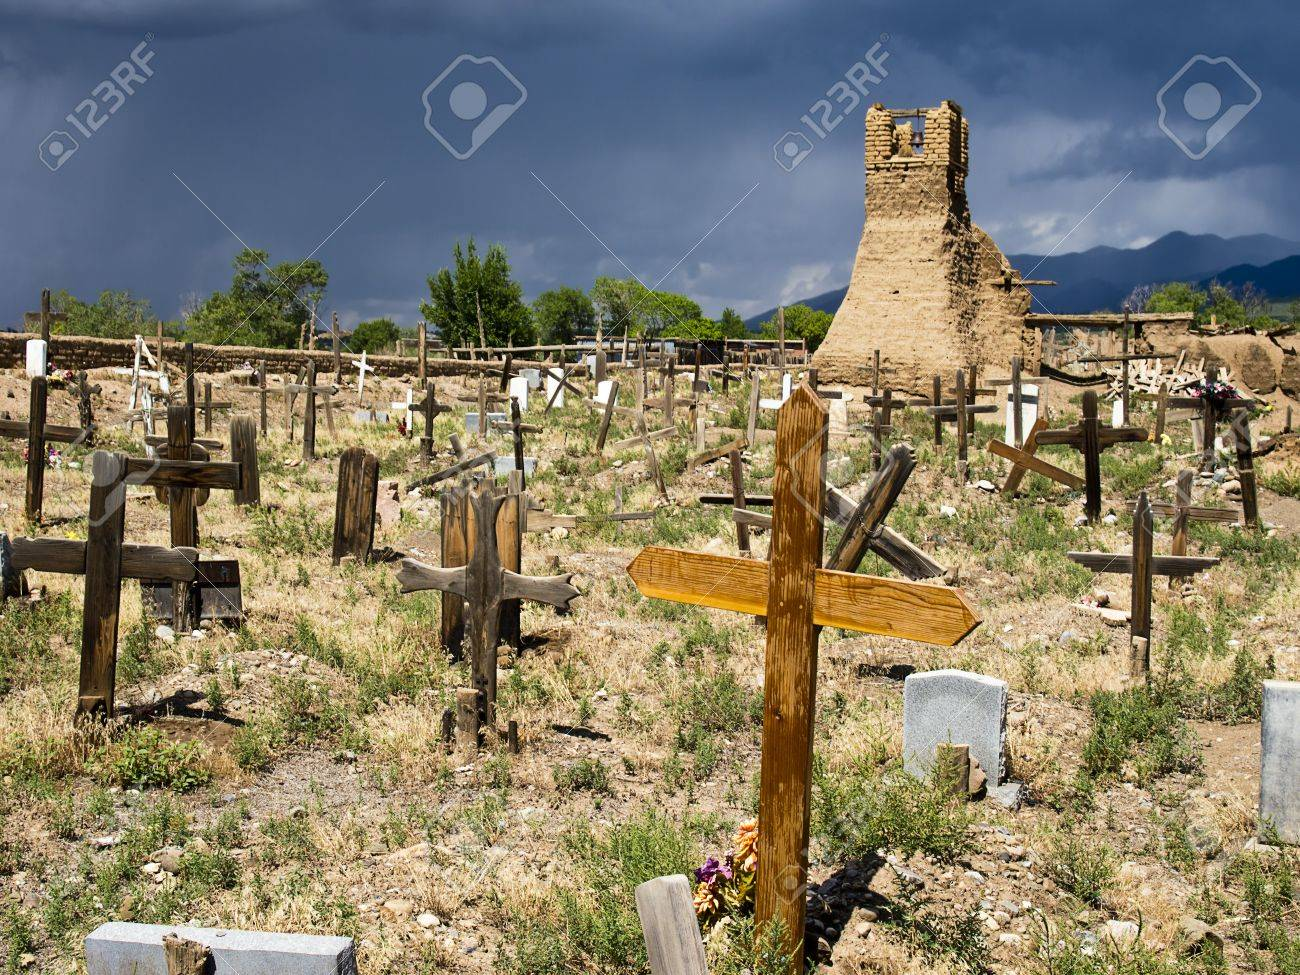 The old cemetery, surrounding the original church of San Geronimo,